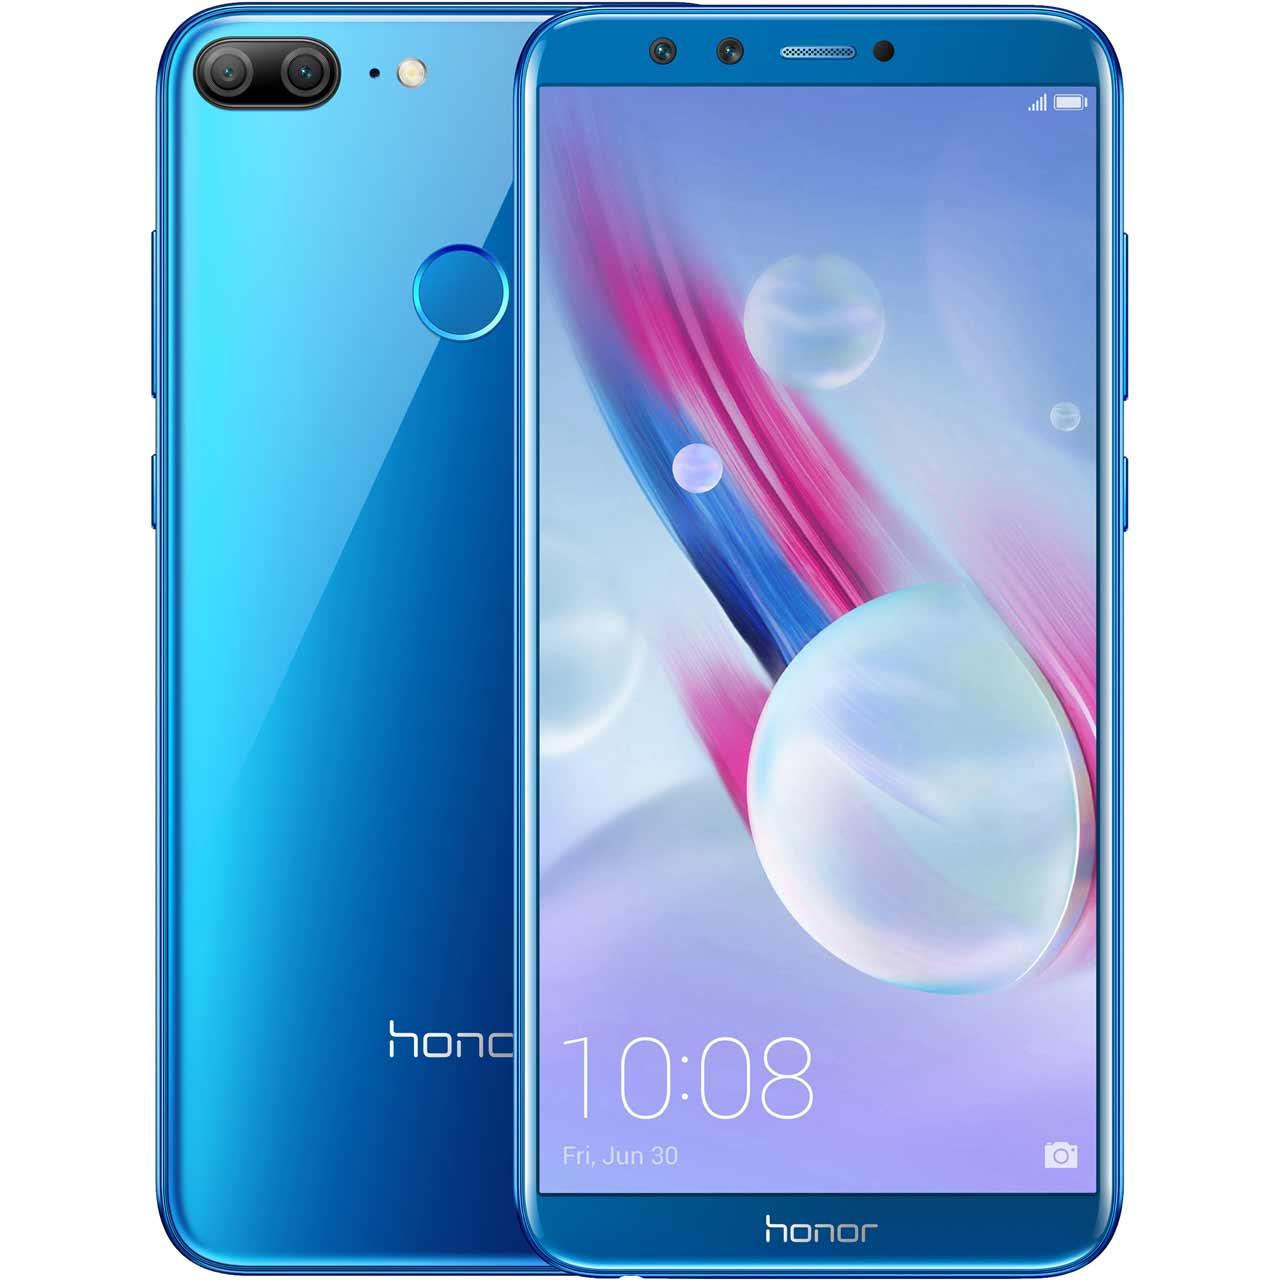 Honor 9 Lite 32GB Smartphone in Blue £159 @ AO